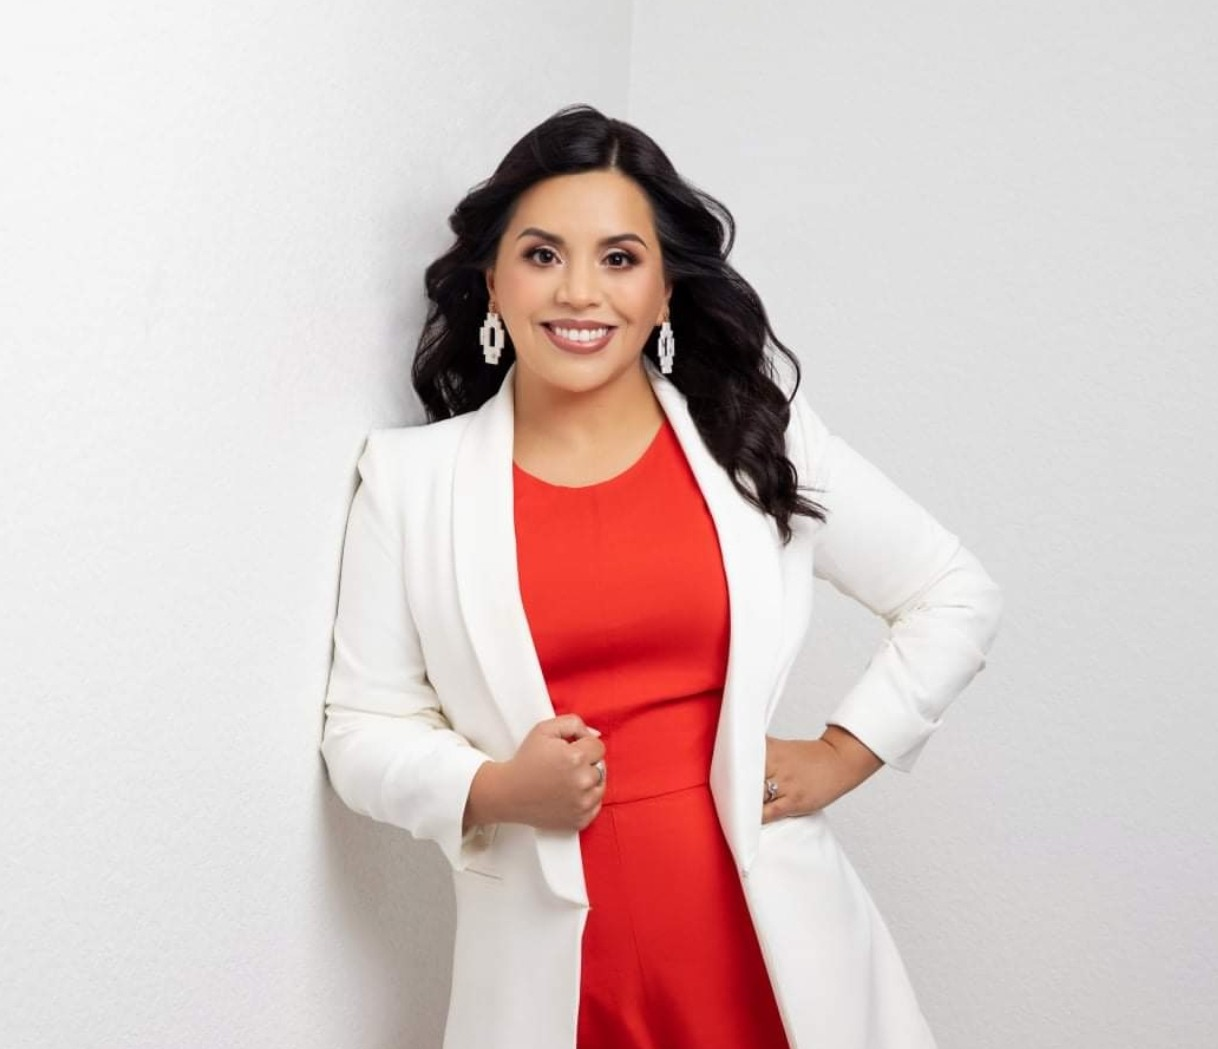 Olga Barrientos